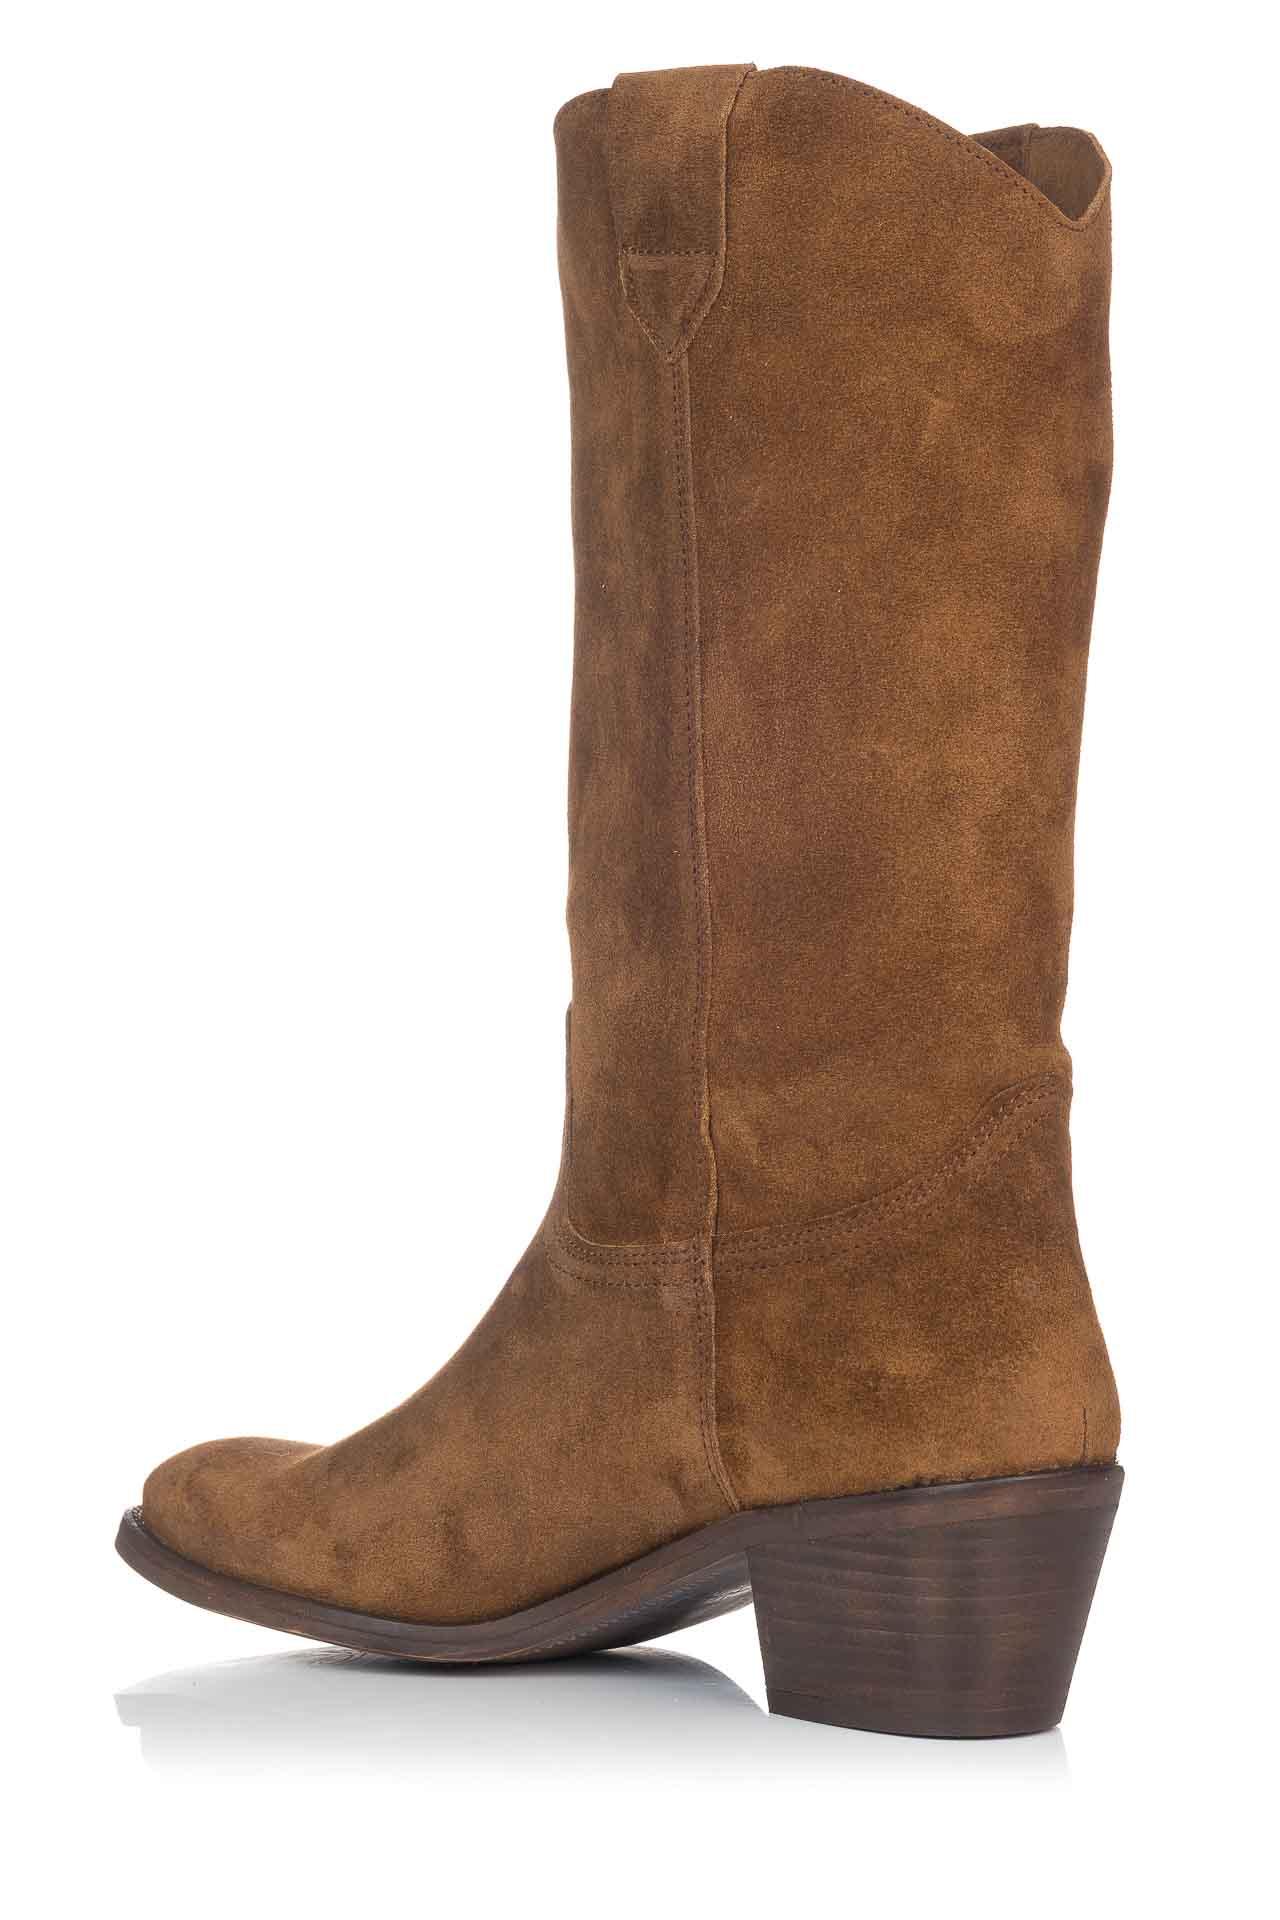 Bota campera estrover lateral Dakota Boots